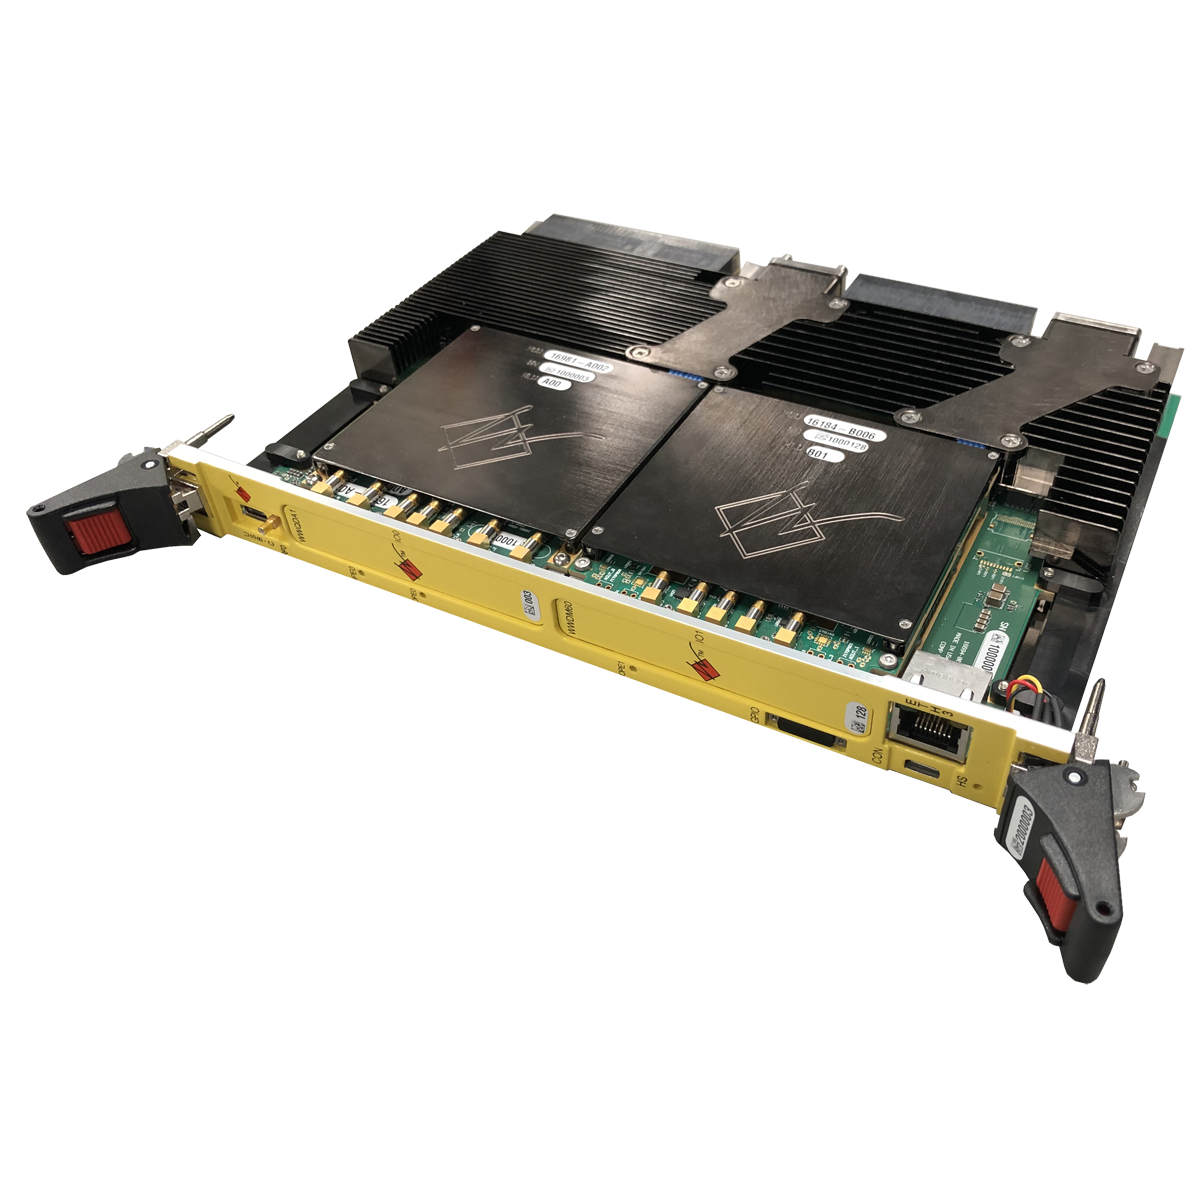 Xilinx Virtex UltraScale+ FPGA Board with Zynq Quad ARM CPU